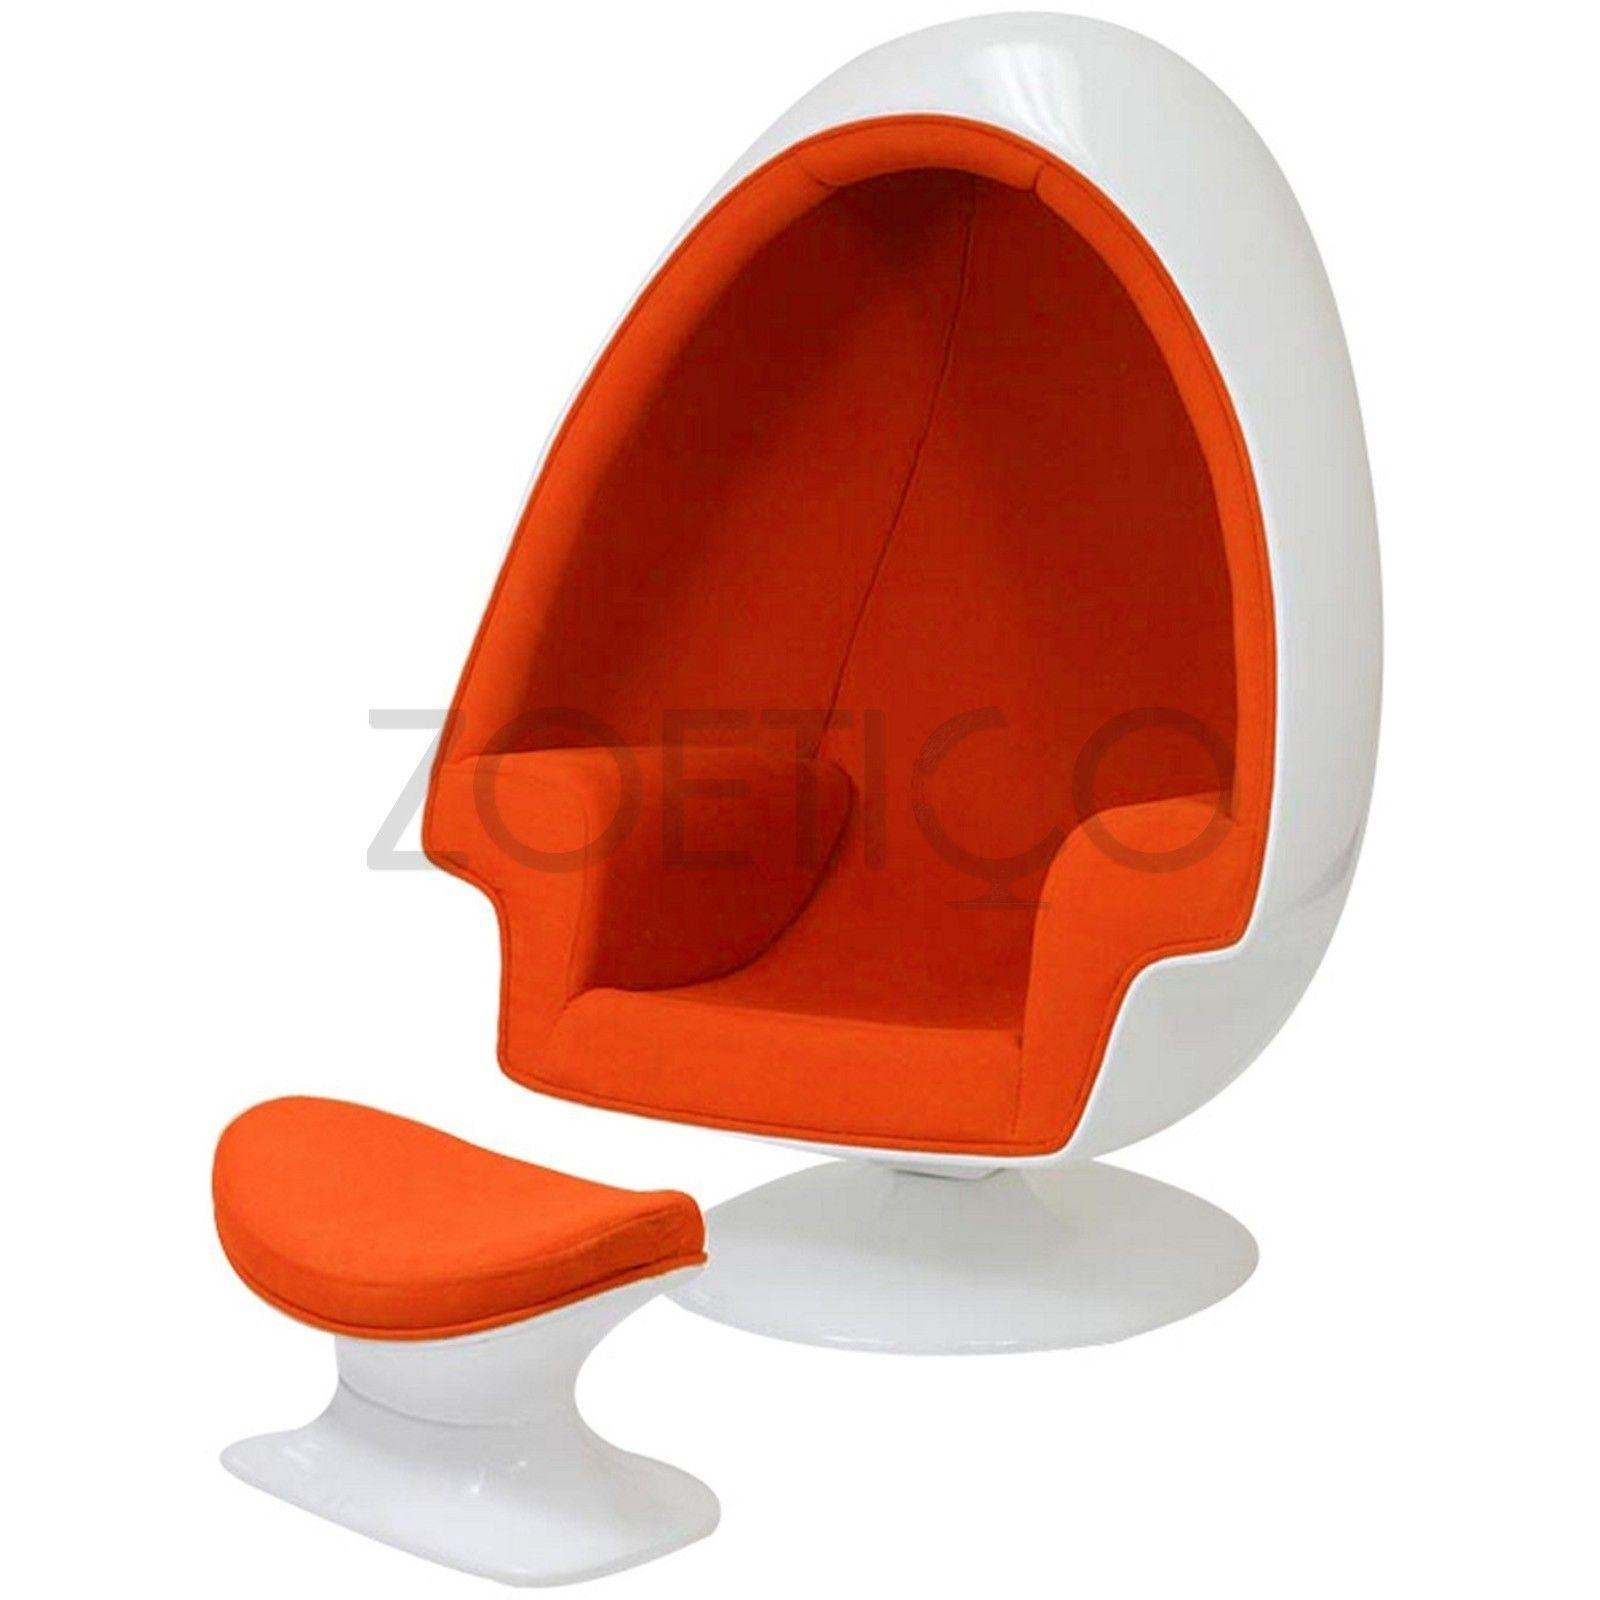 arne jacobsen furniture. Arne Jacobsen Furniture